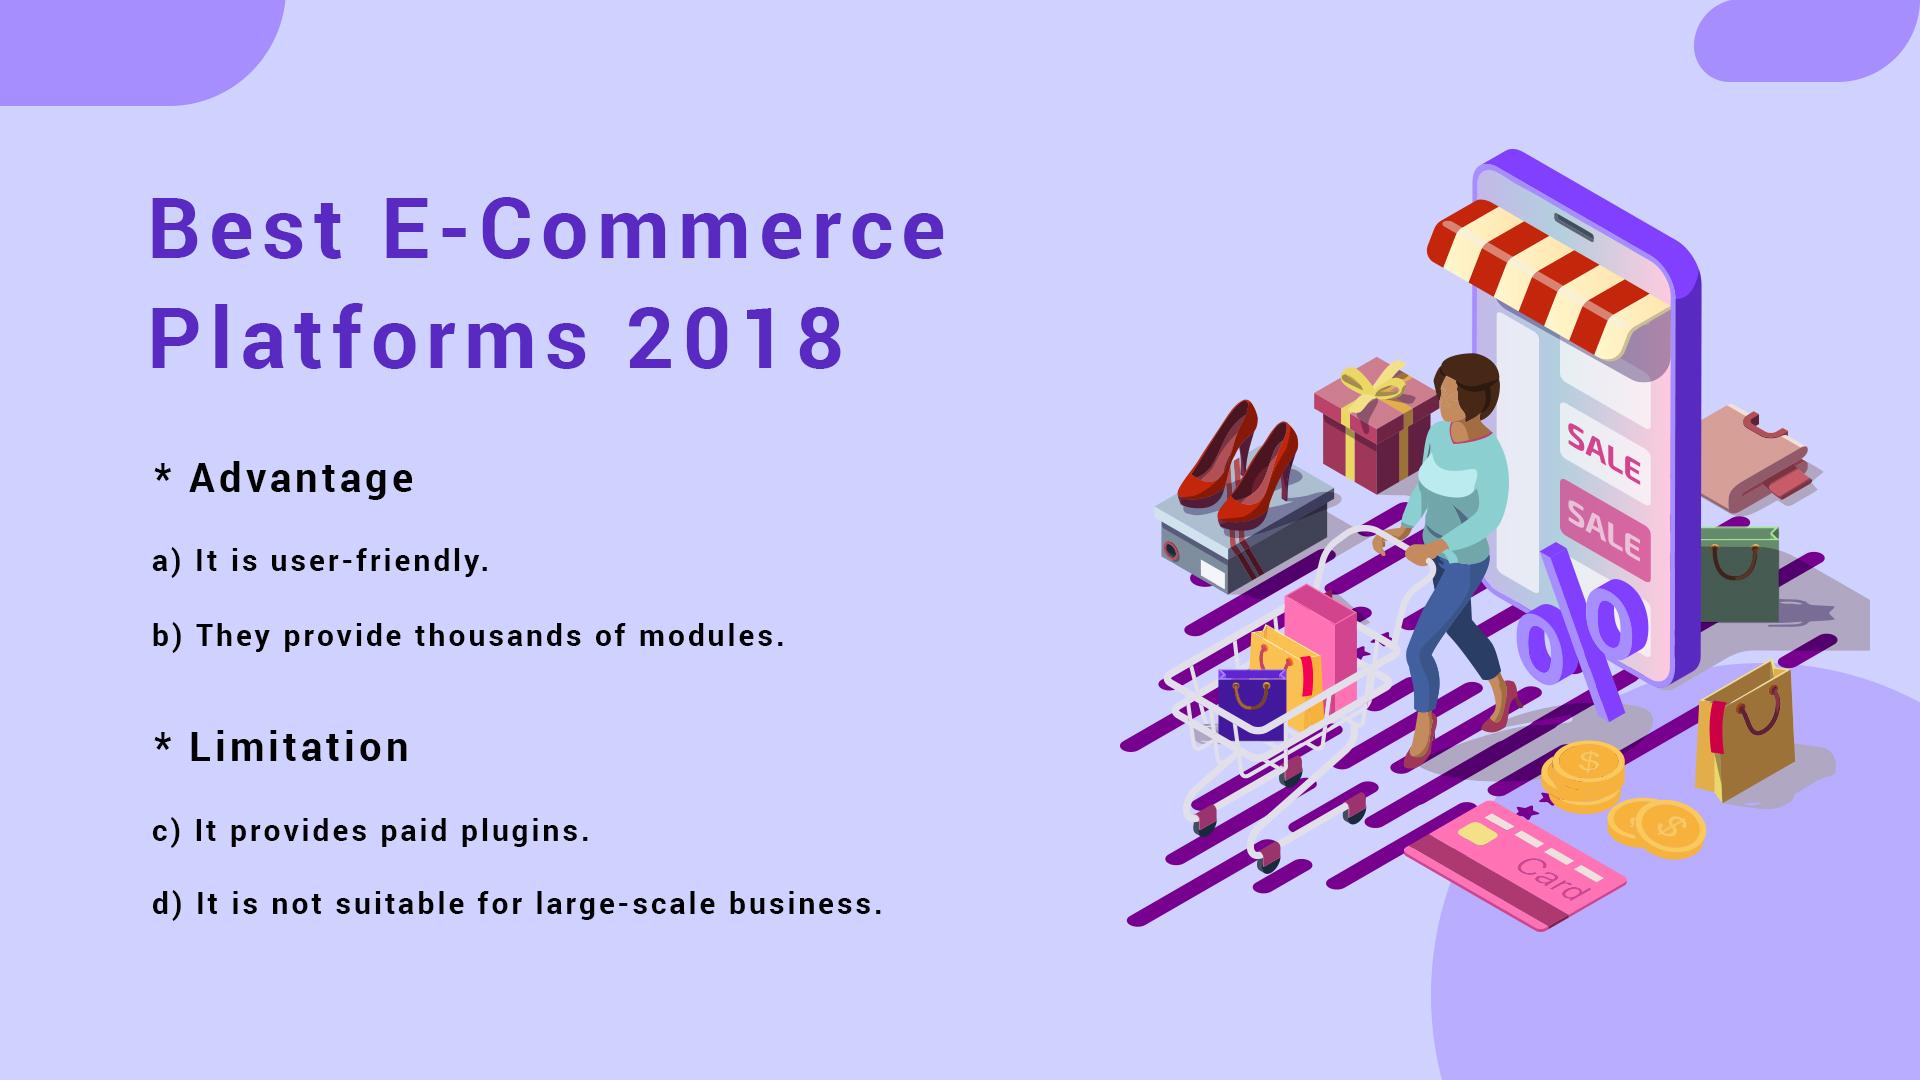 Best E-commerce Platforms 2018